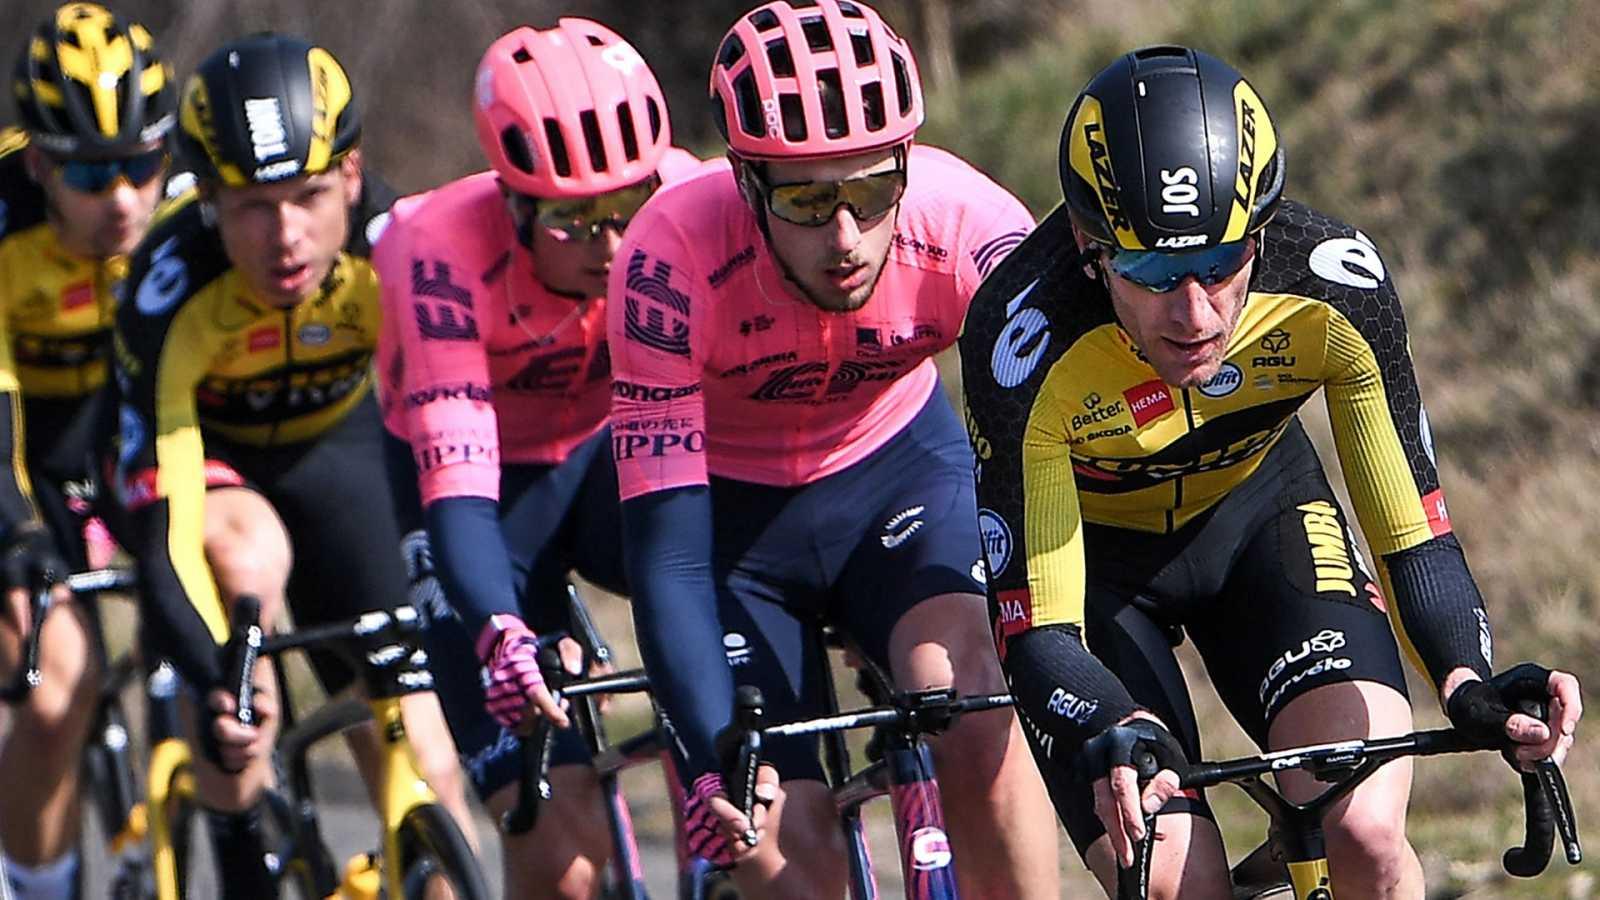 Ciclismo - París-Niza. 4ª etapa: Chalon-sur-Saône - Chiroubles - ver ahora